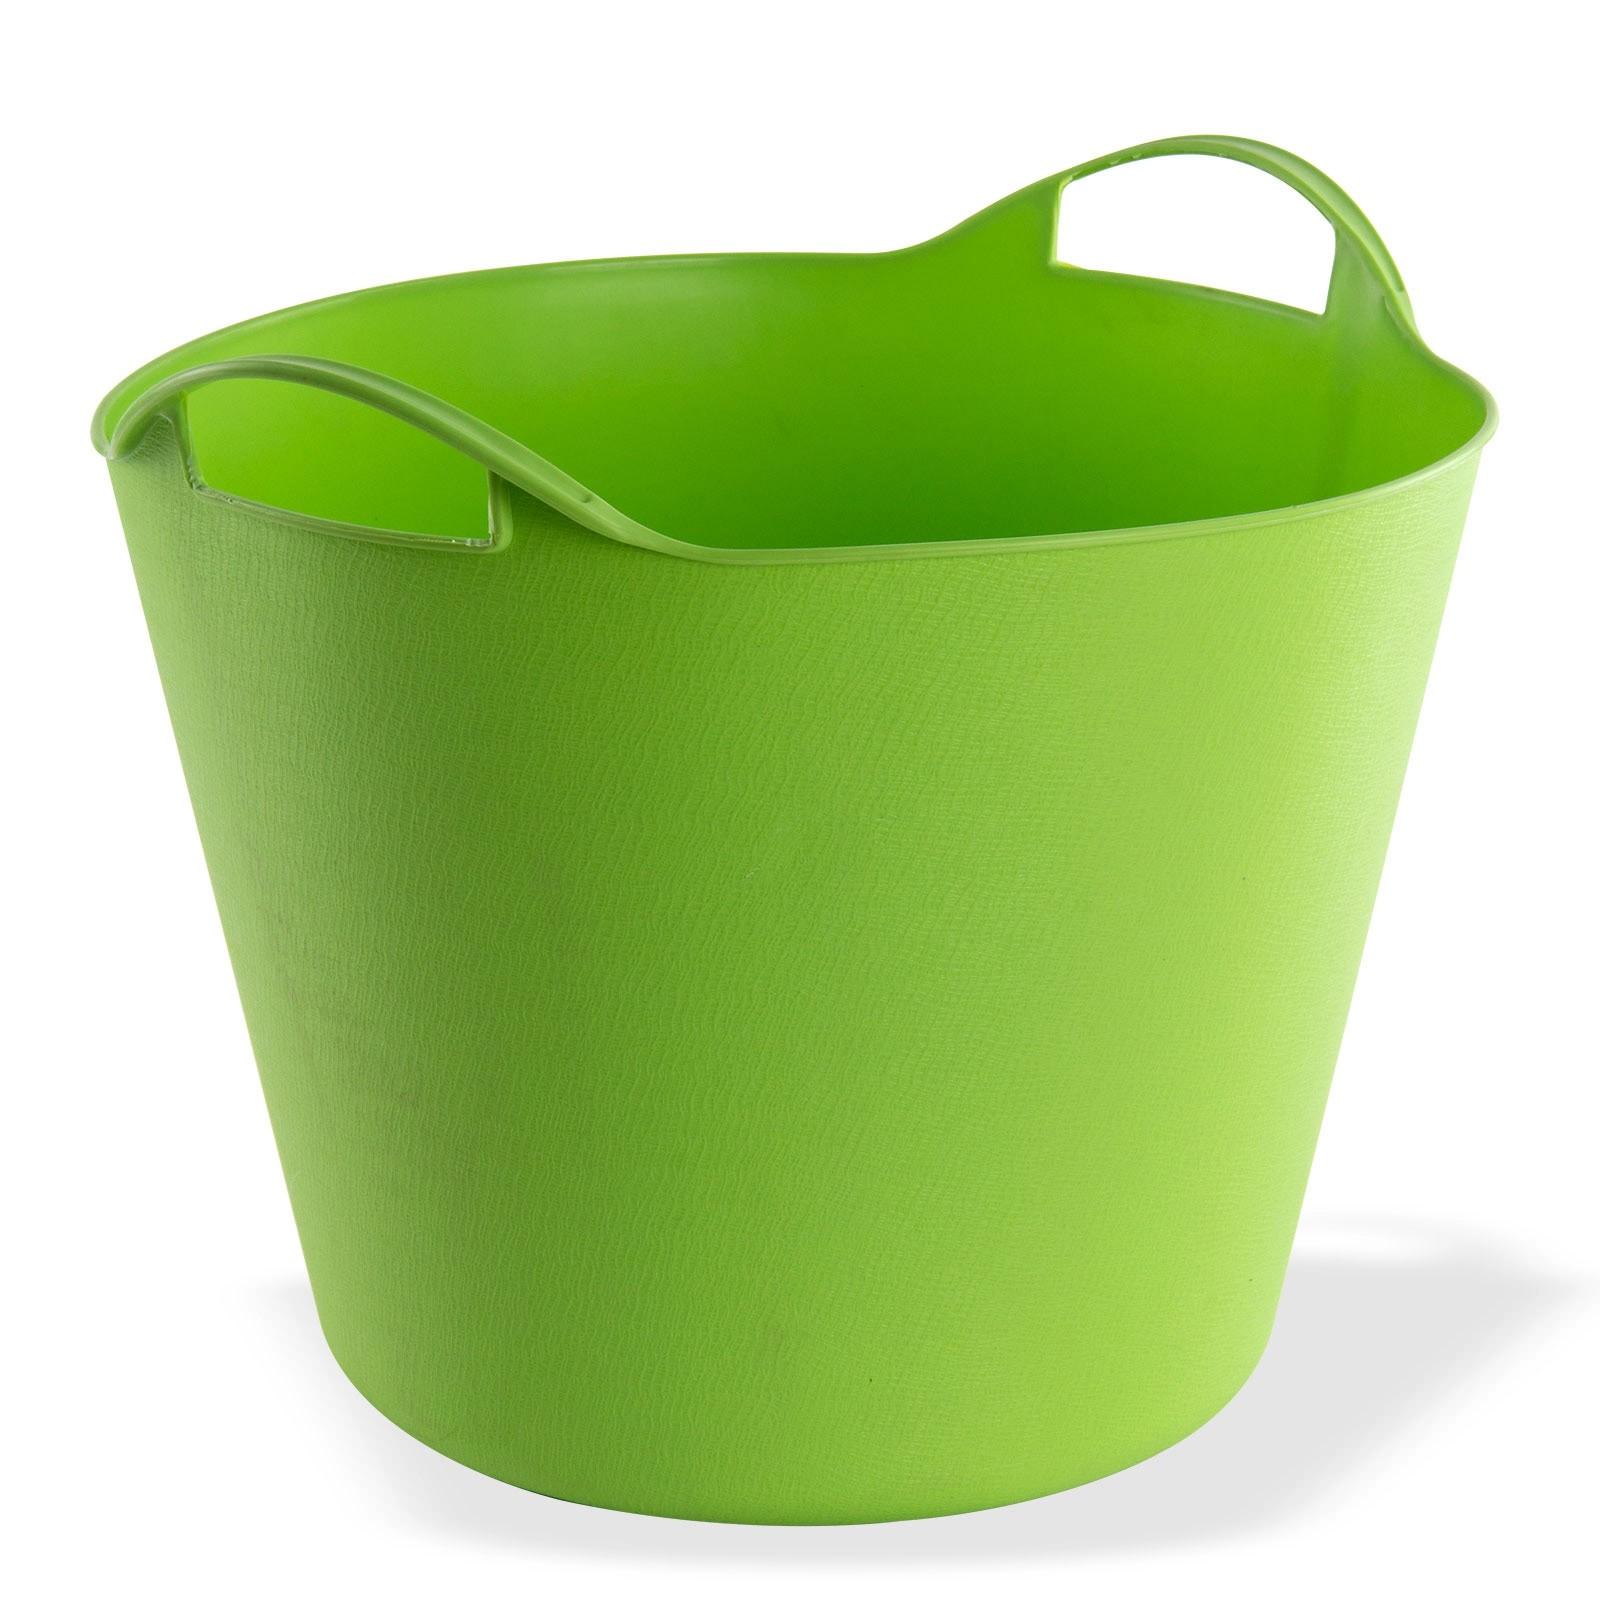 Dema Multikorb Eimer flexibel 25 Liter grün 15140